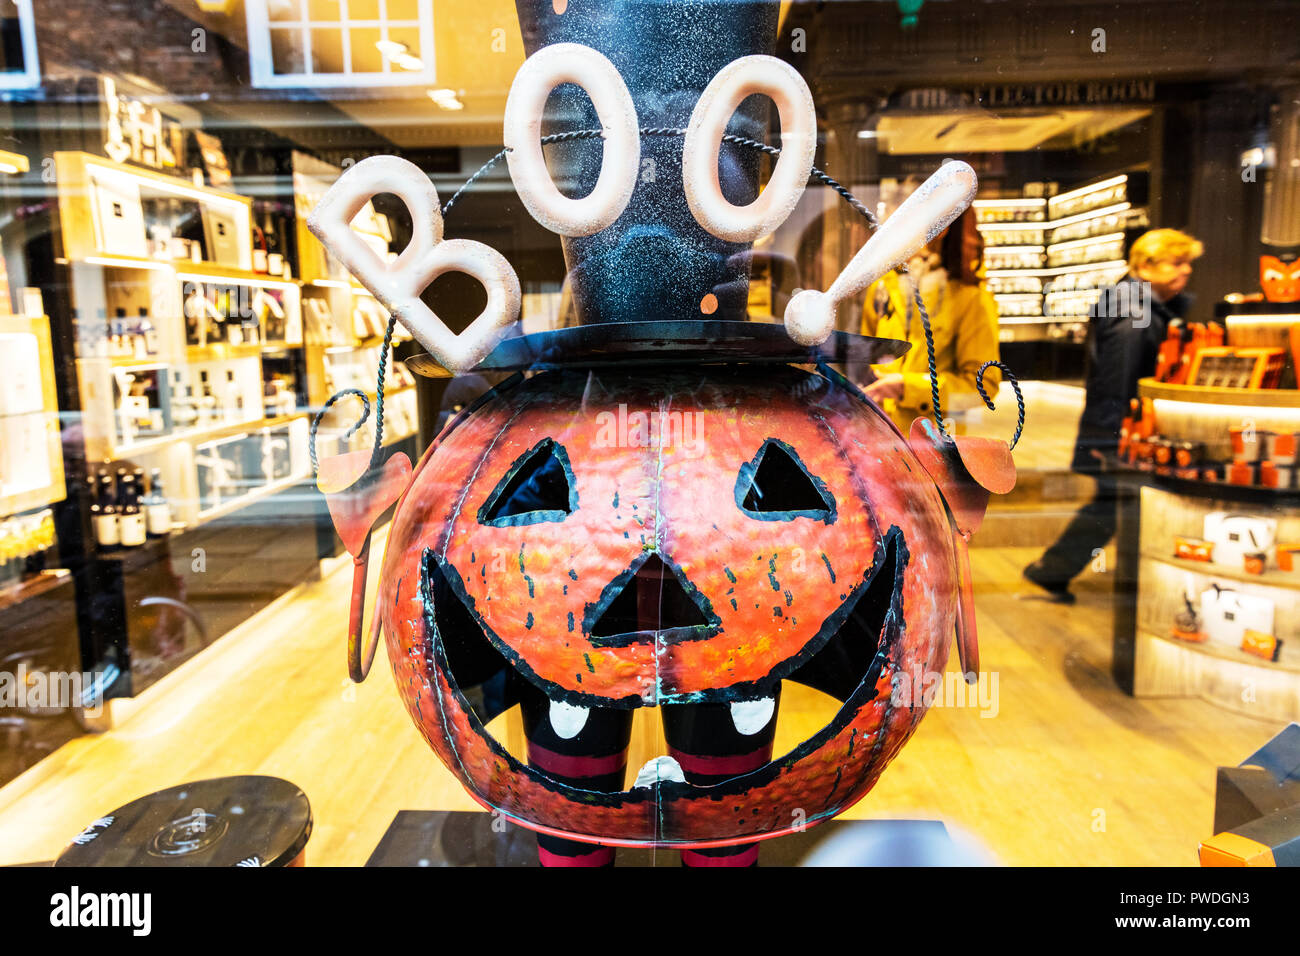 Halloween Pumpkin, Scary pumpkin, frightening pumpkin, Halloween, pumpkin, pumpkins, scary, boo, boo!, boo above pumpkin, pumpkin Halloween, Helloween - Stock Image